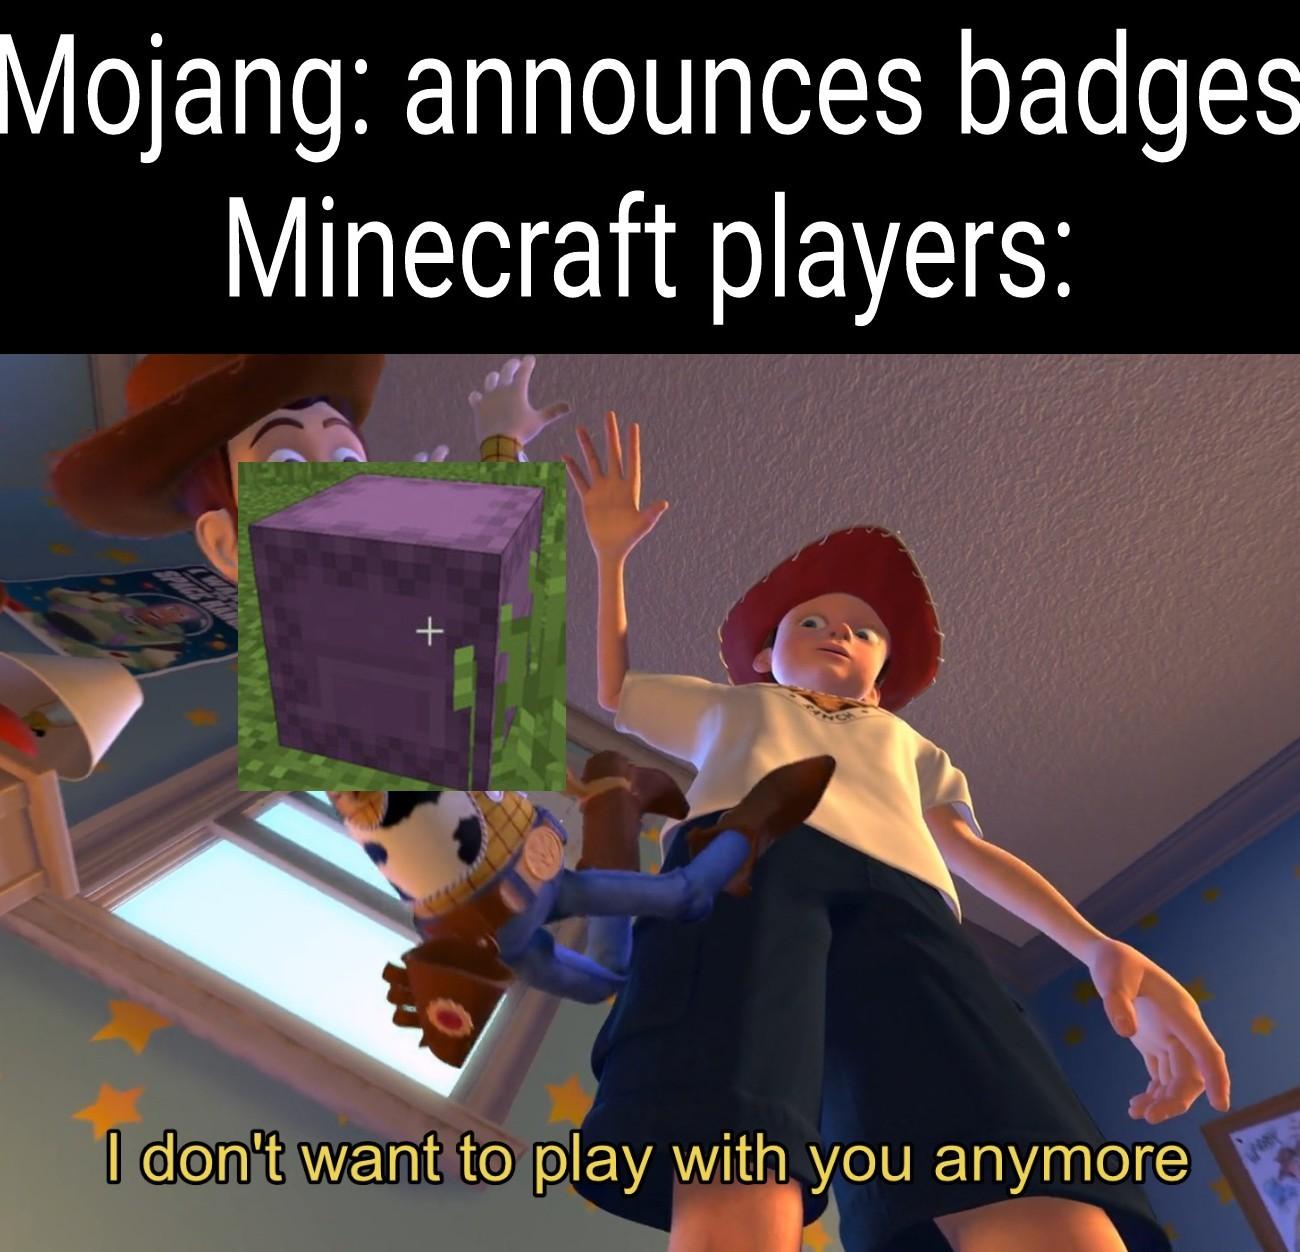 Only minecraft players understand - meme